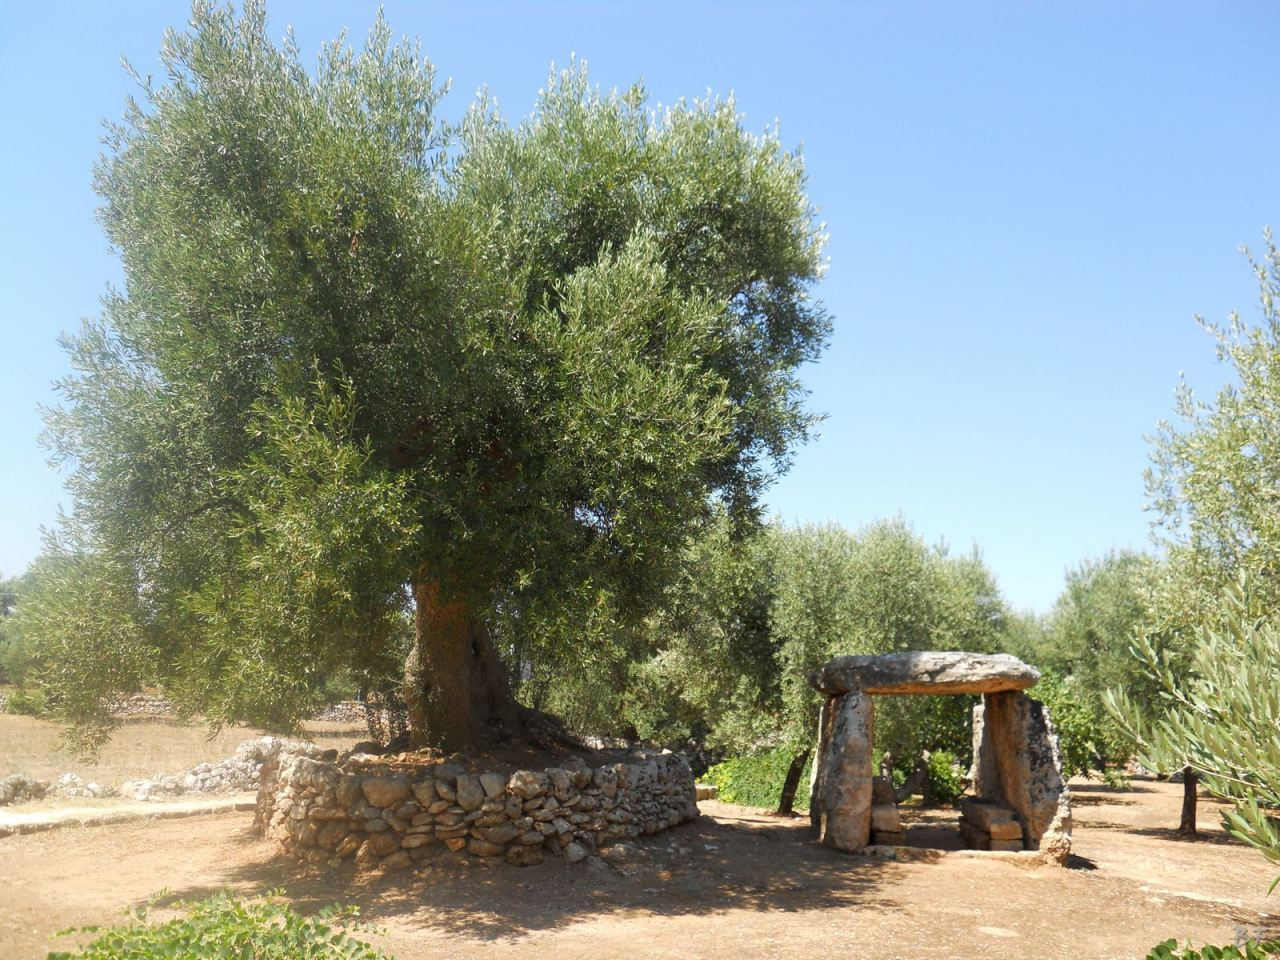 Dolmen-Montalbano-Fasano-Ostuni-Megaliti-Salento-Brindisi-Puglia-Italia-2